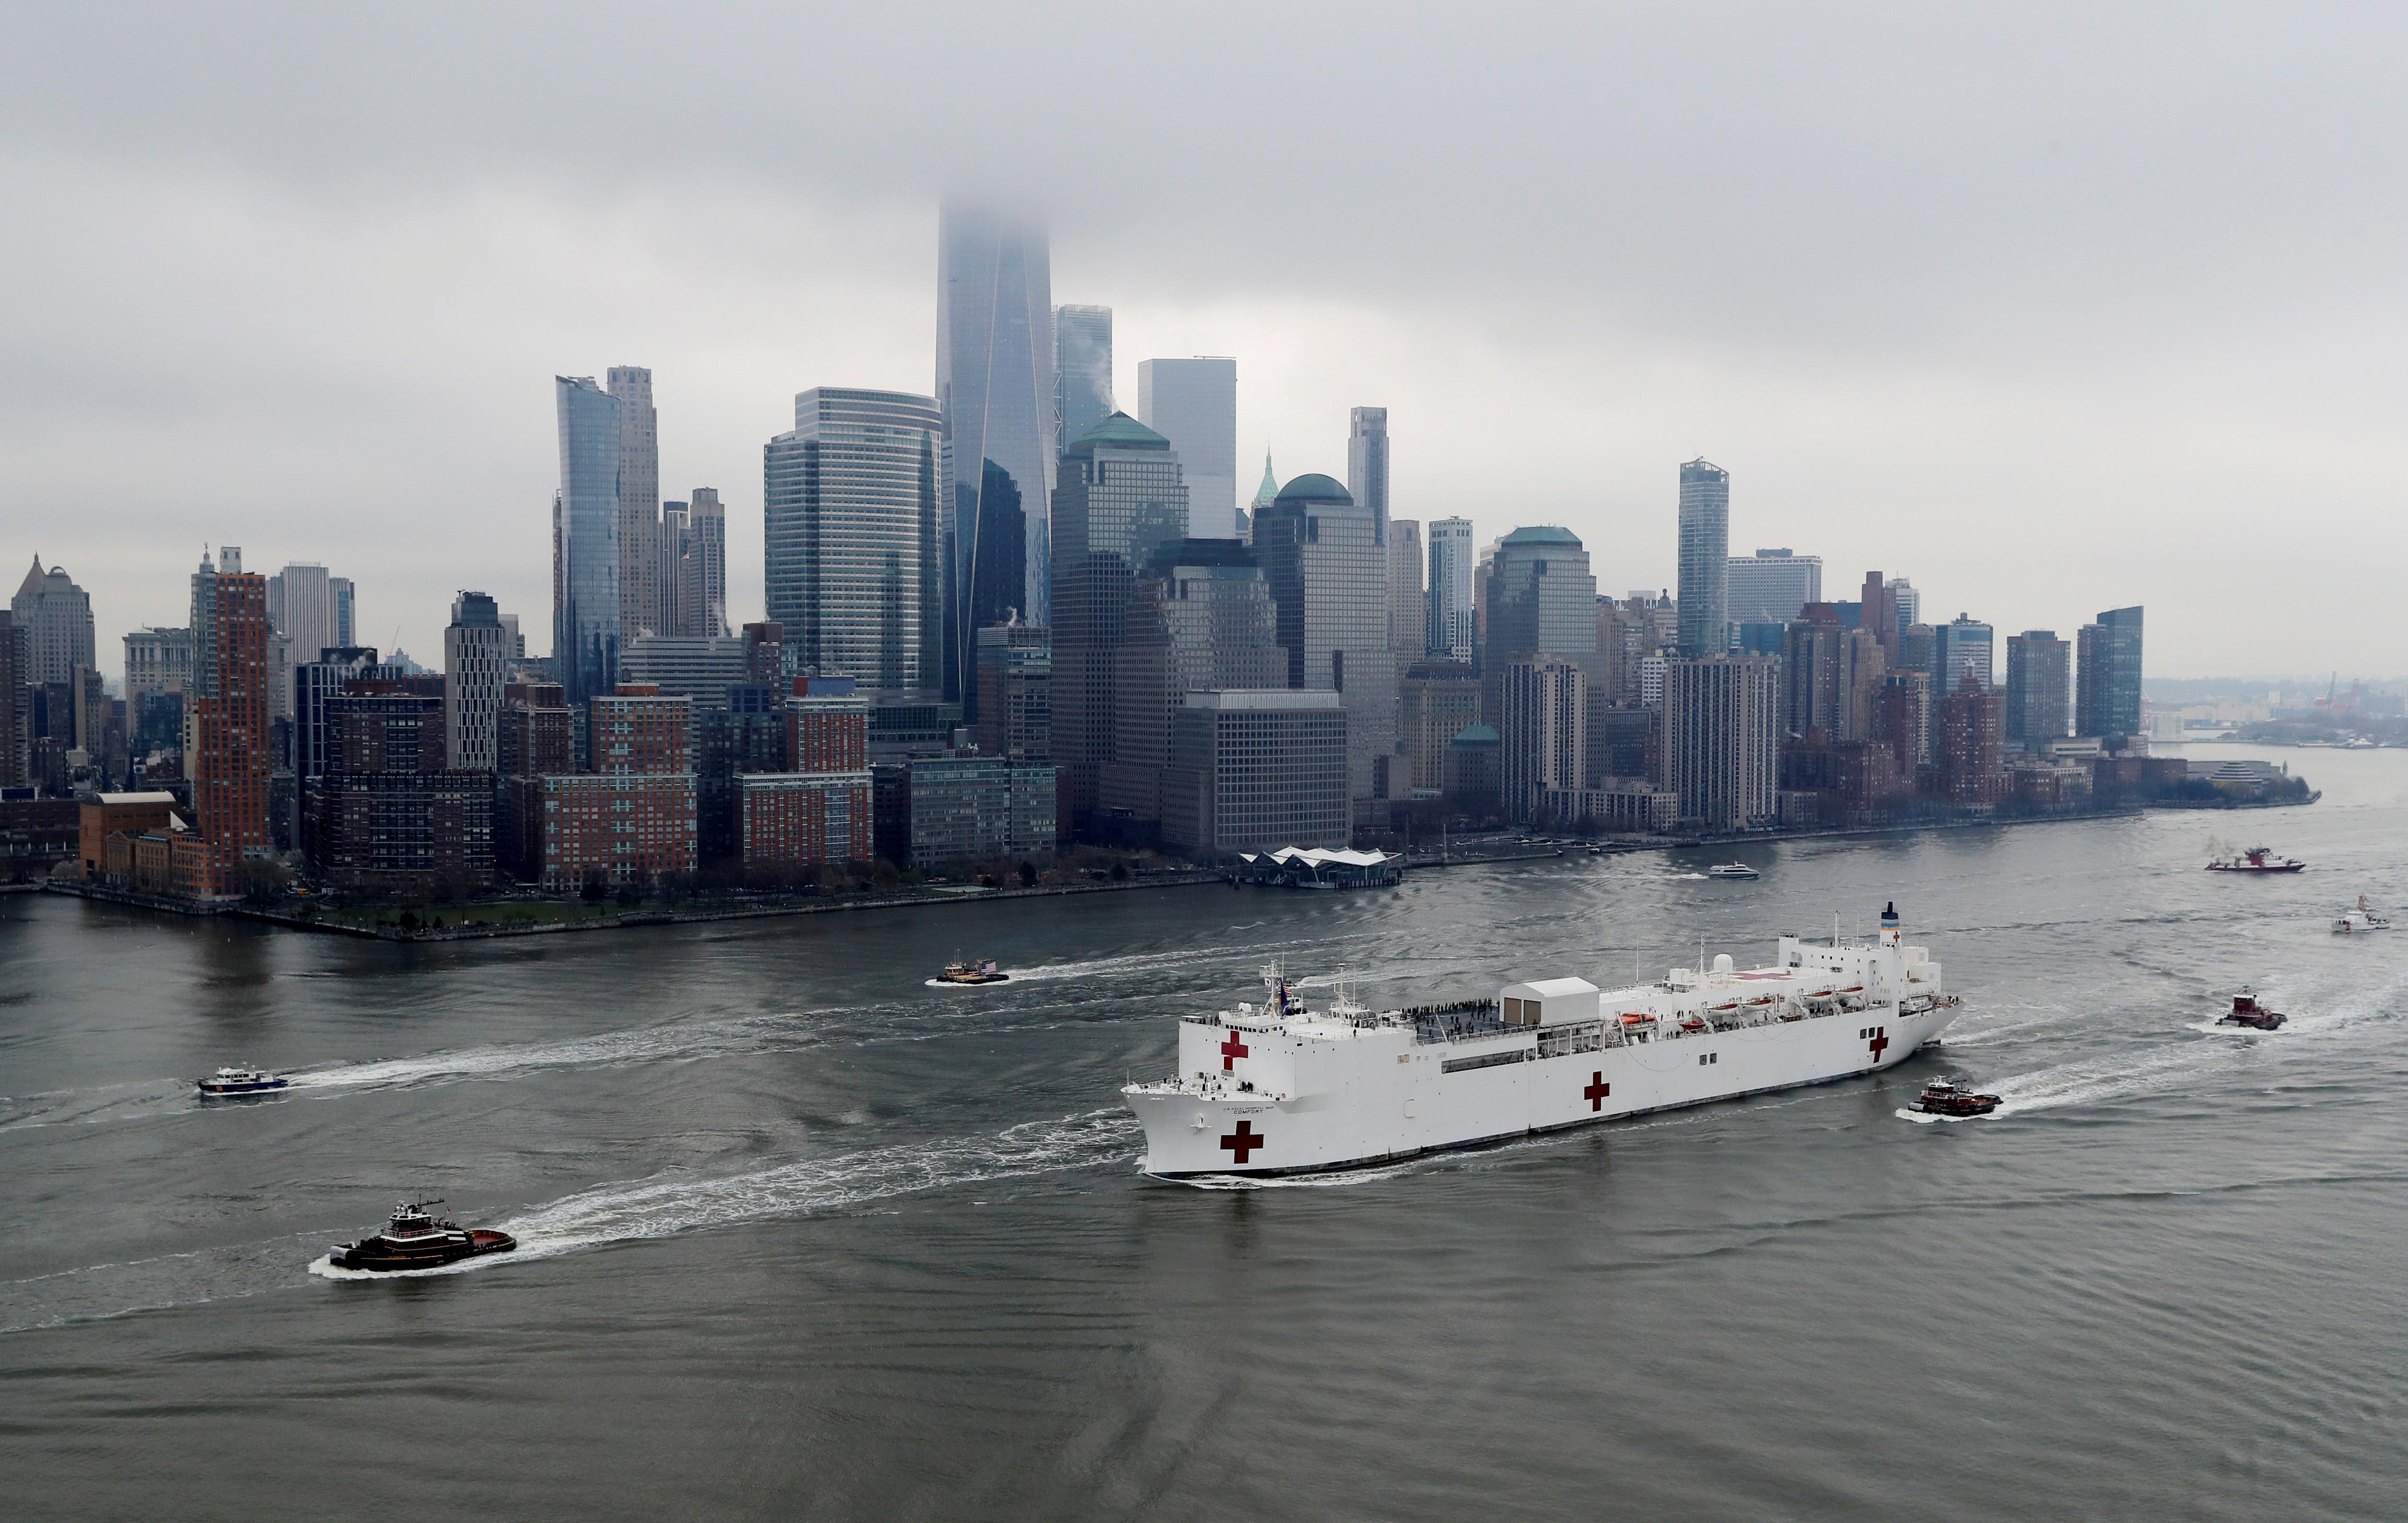 El USNS Comfort pasa por Manhattan preparado para asistir a pacientes con coronavirus (REUTERS/Mike Segar)